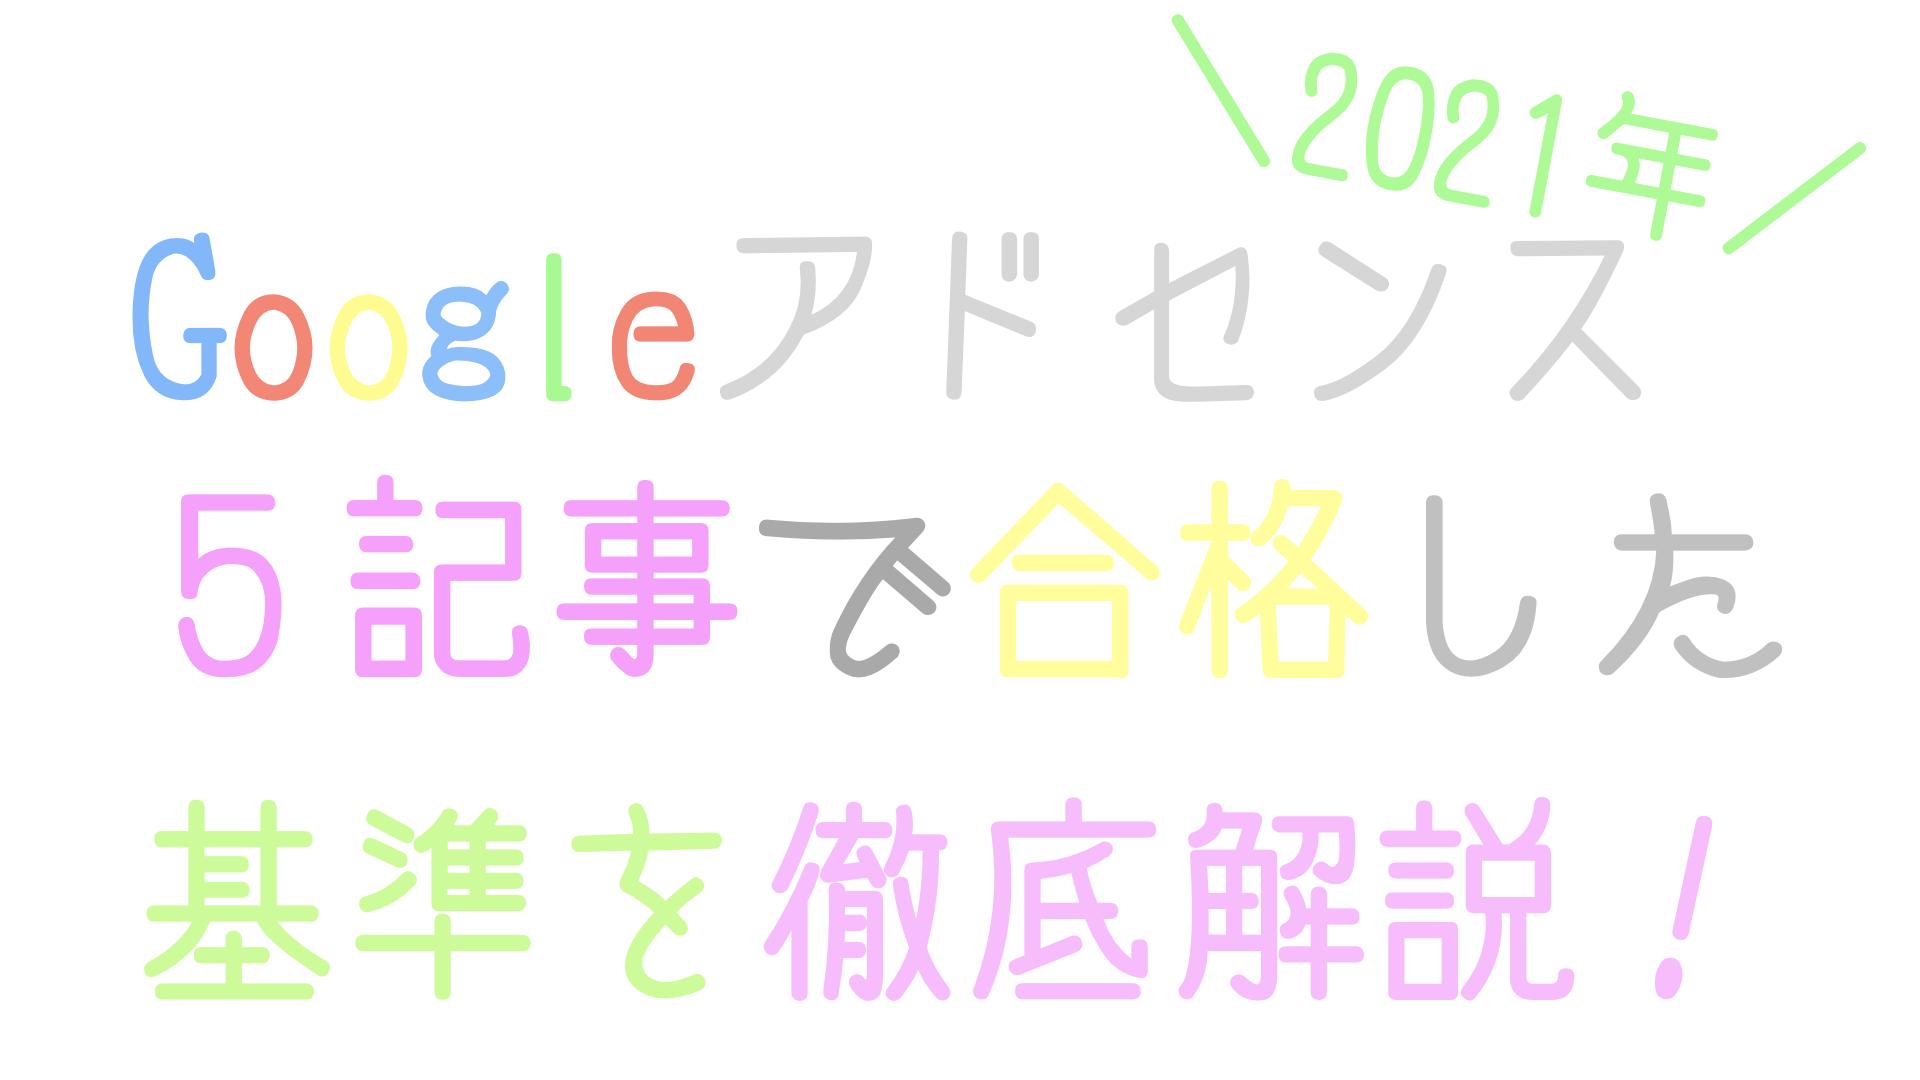 Googleアドセンス5記事で合格した基準を徹底解説